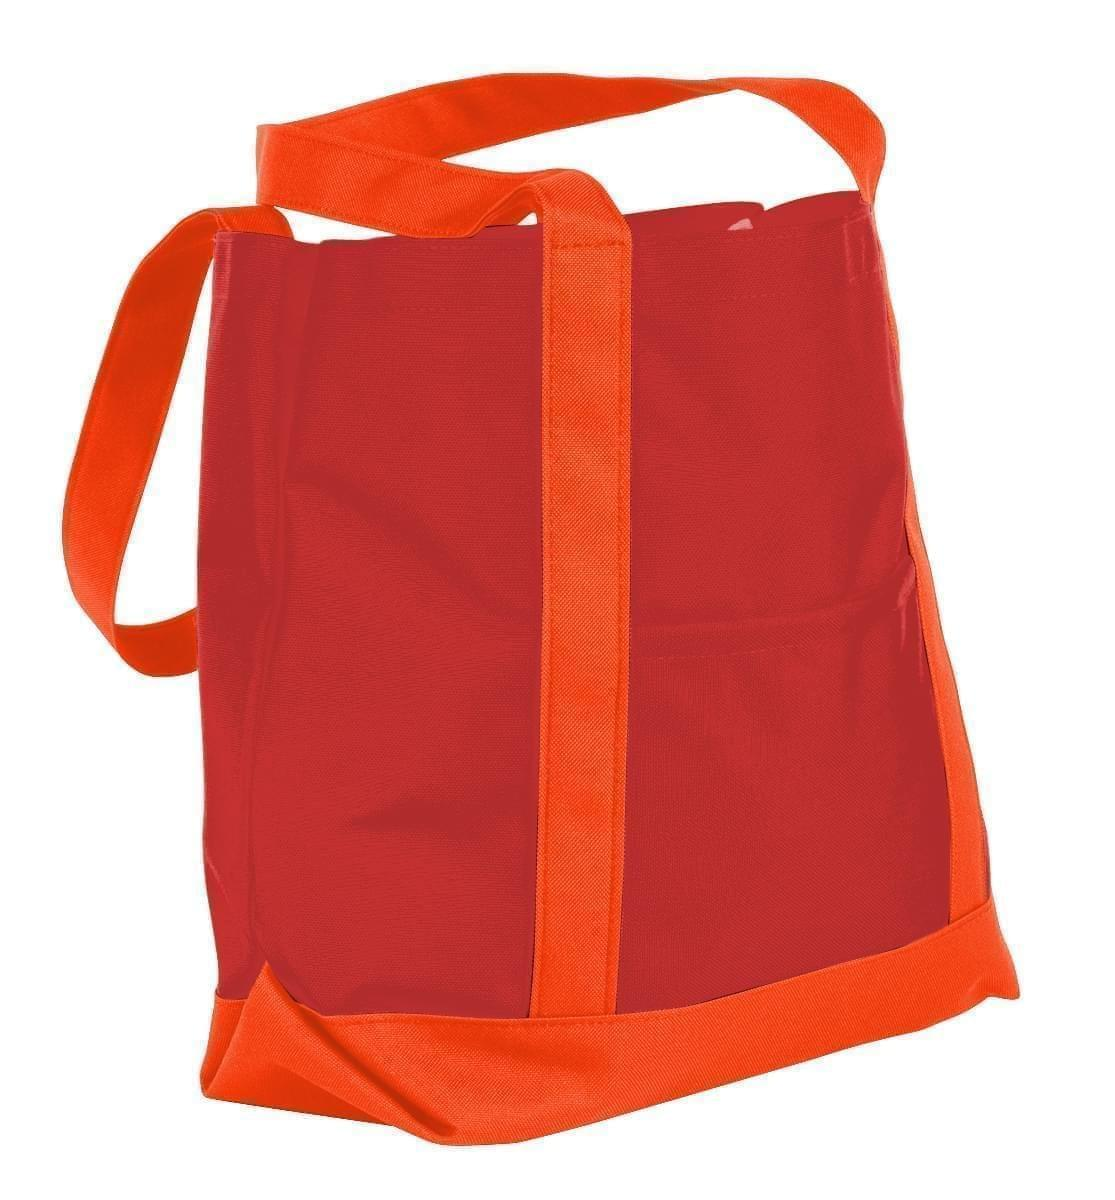 USA Made Nylon Poly Boat Tote Bags, Red-Orange, XAACL1UAZJ